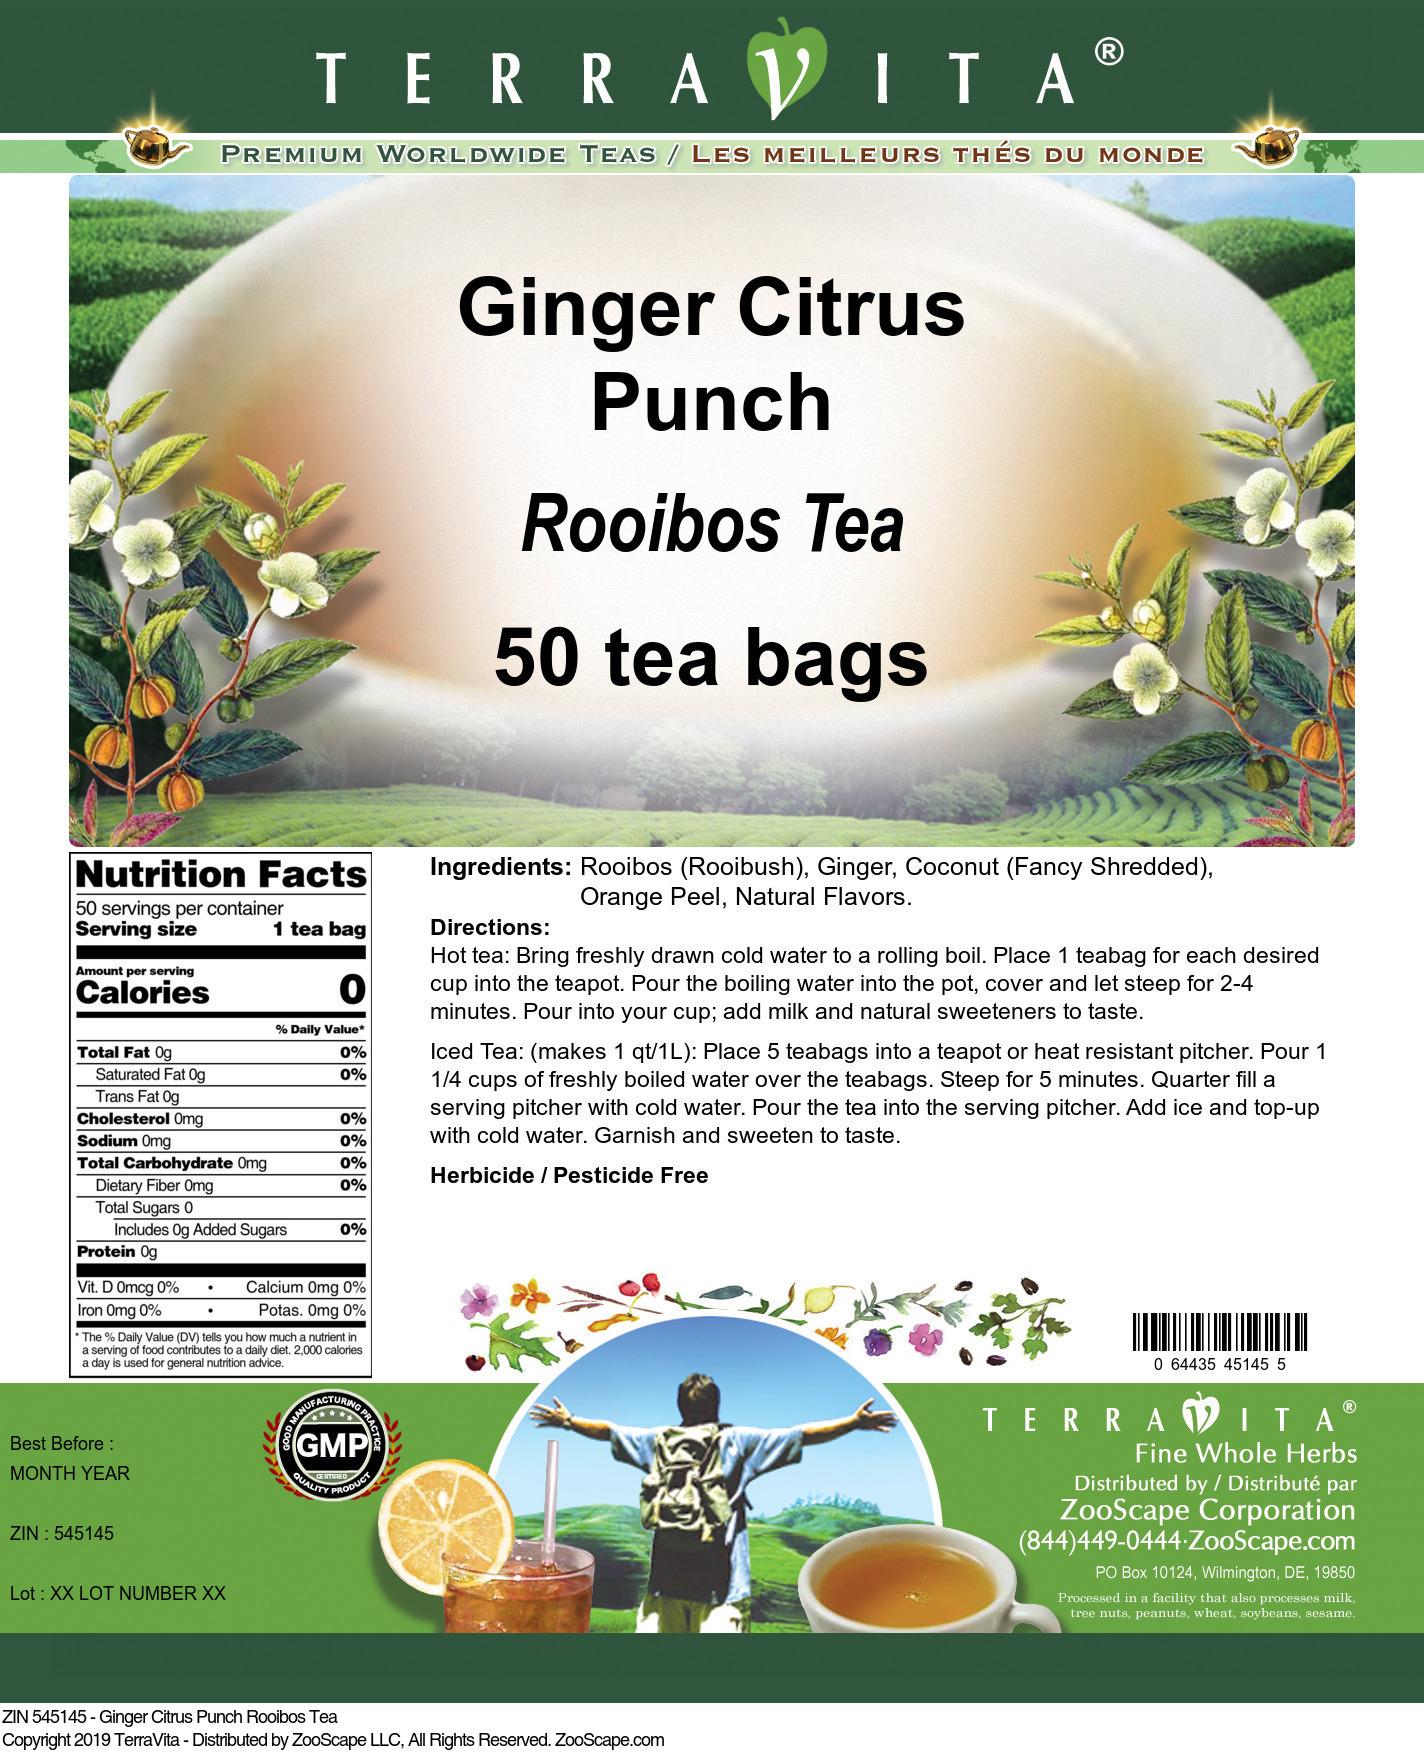 Ginger Citrus Punch Rooibos Tea